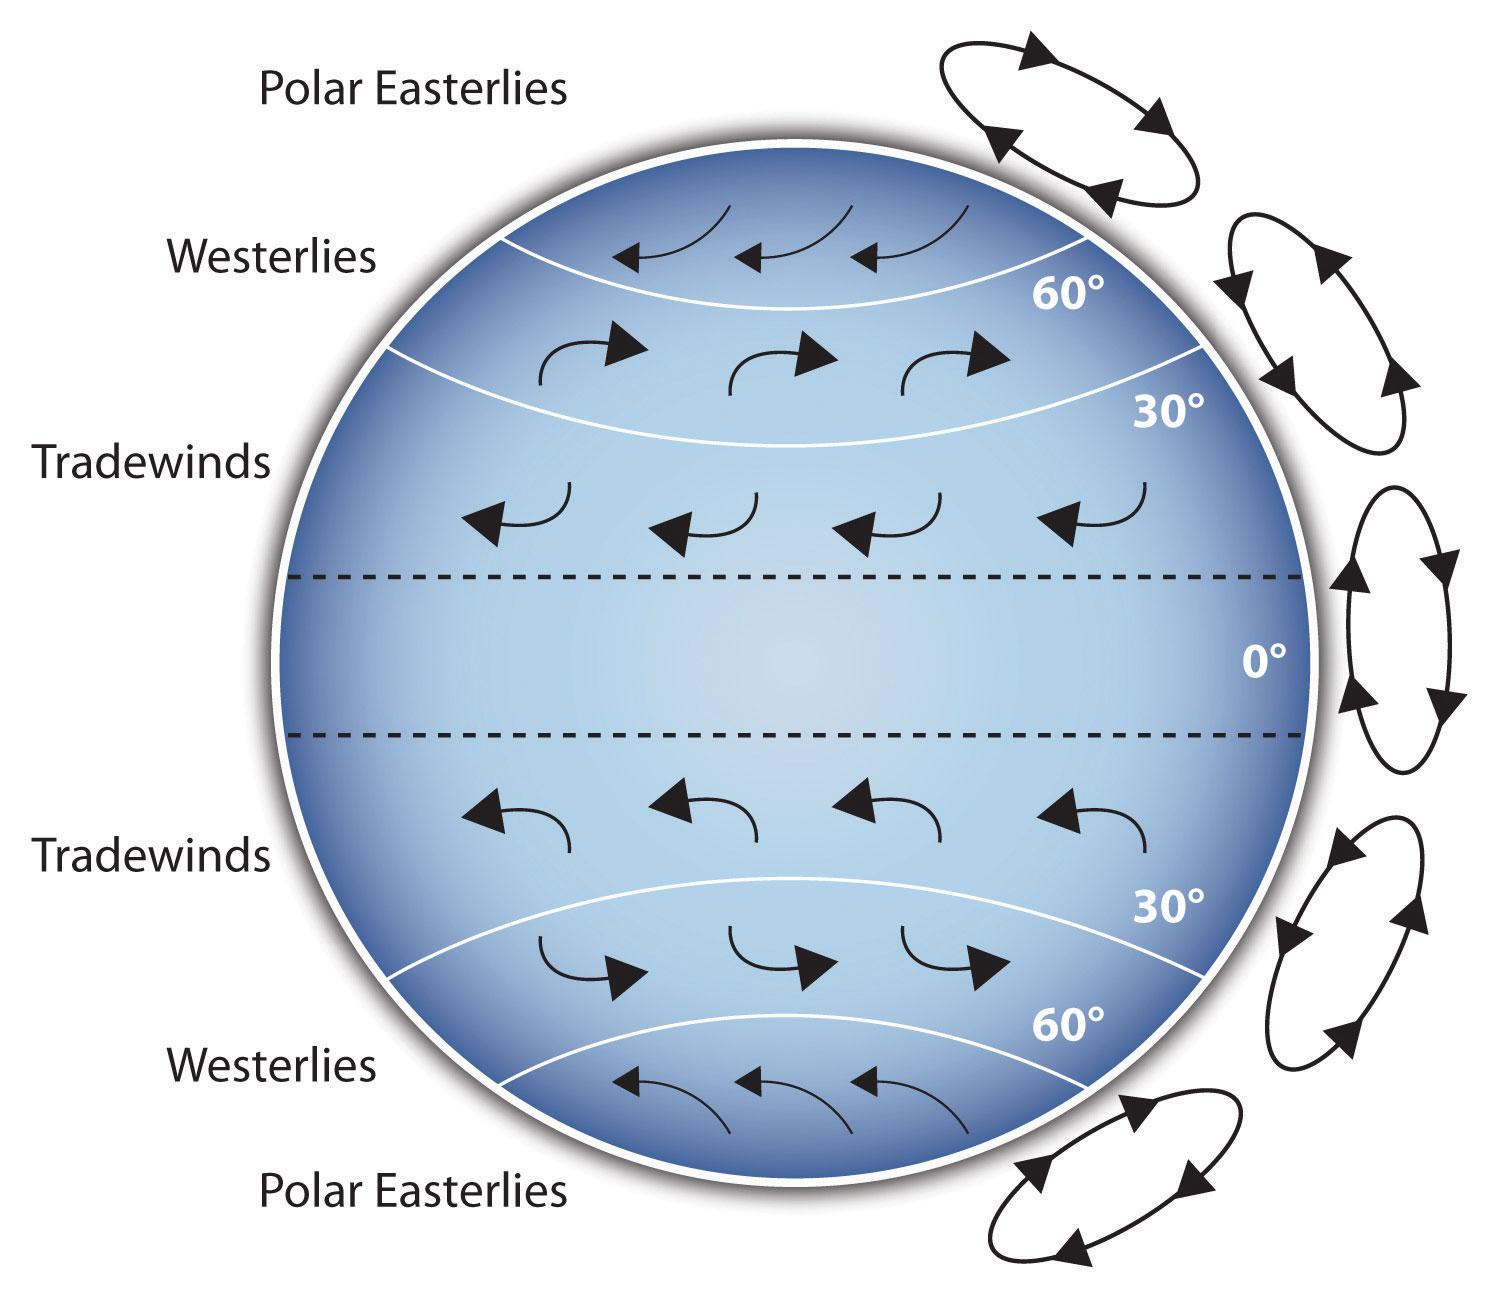 global wind patterns diagram ford ranger wiring 1999 presentation aids design and usage